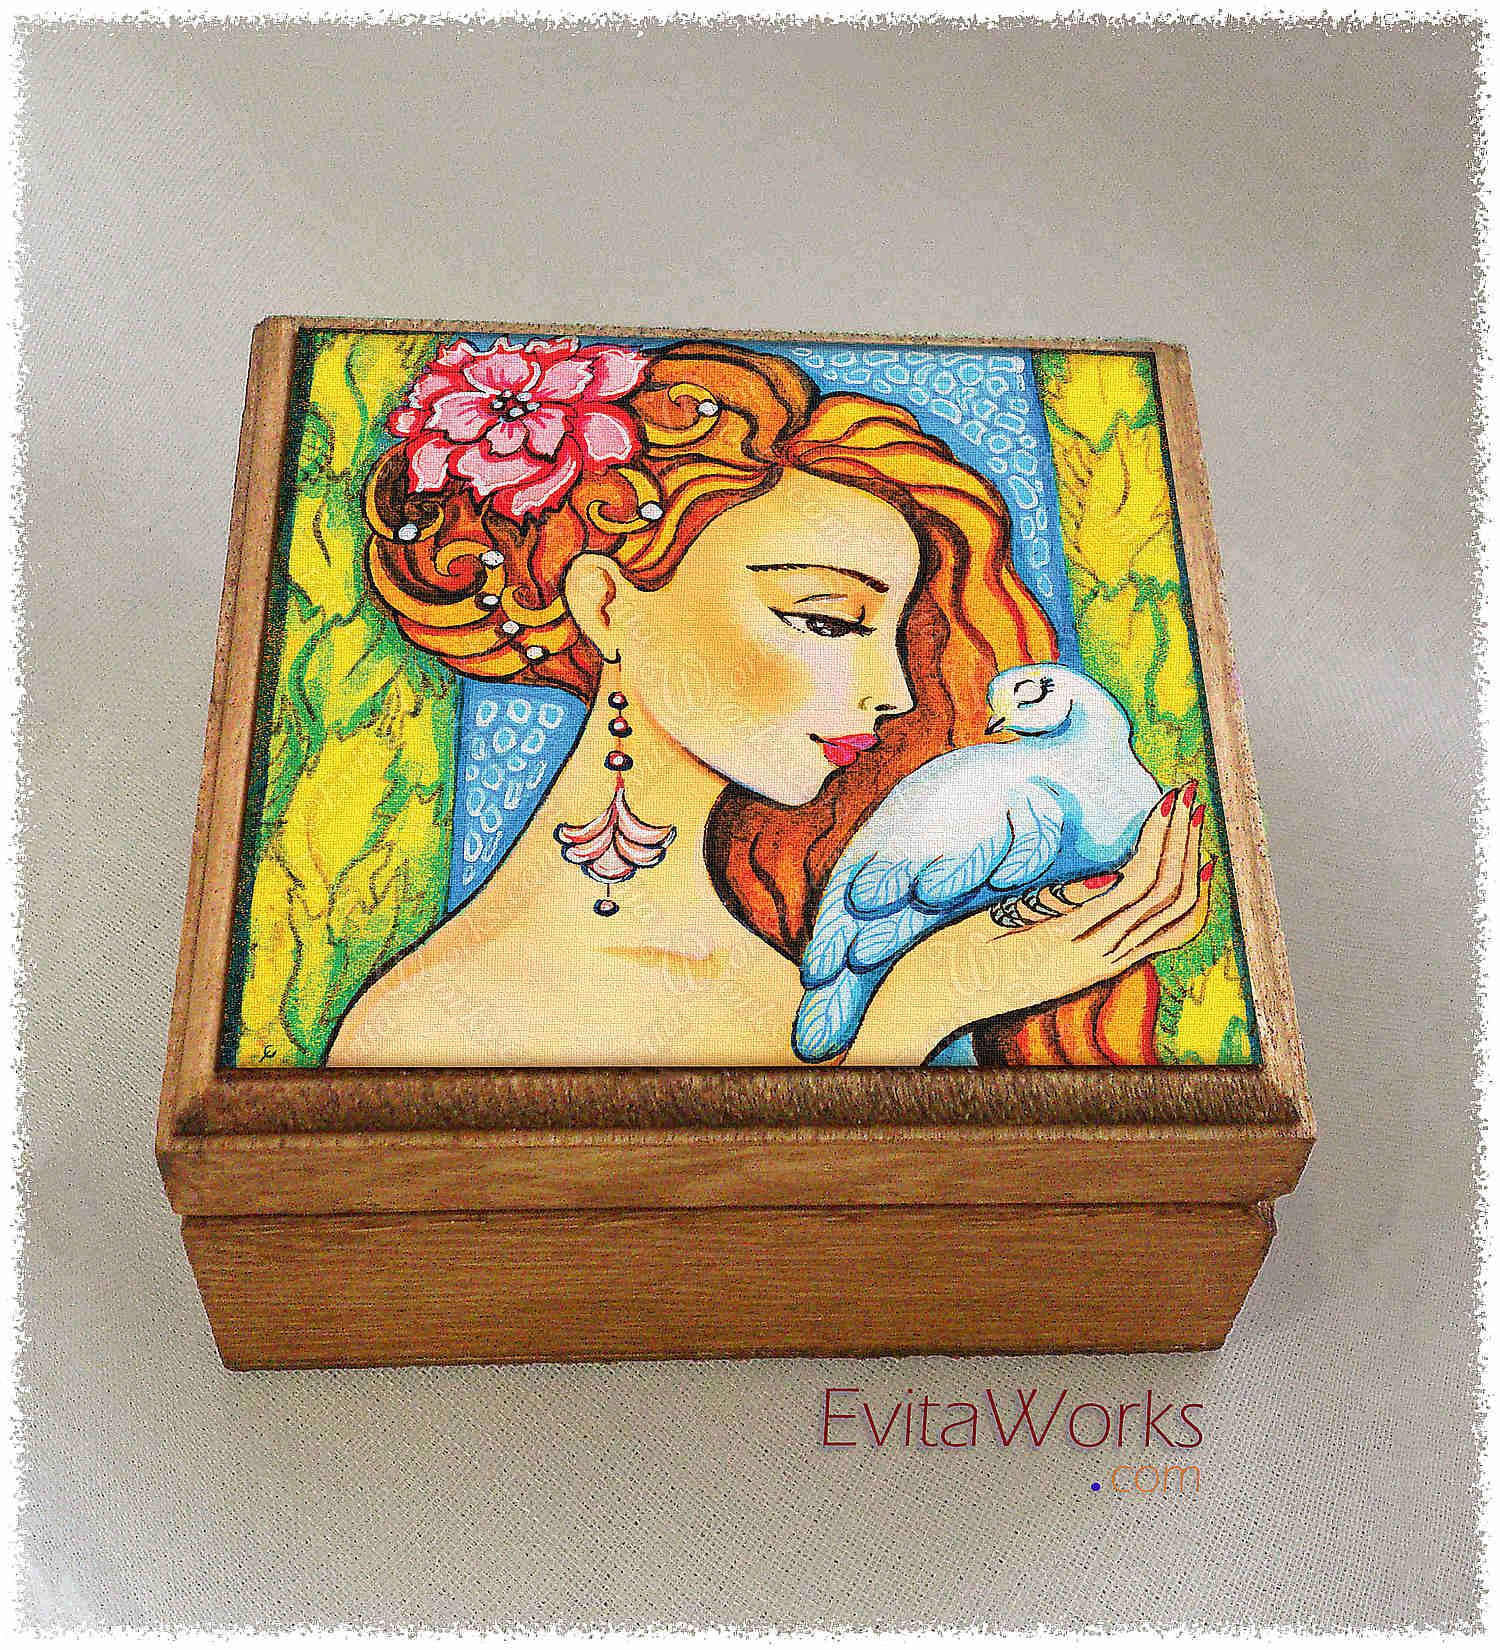 Mermaid 61 Boxsq ~ EvitaWorks